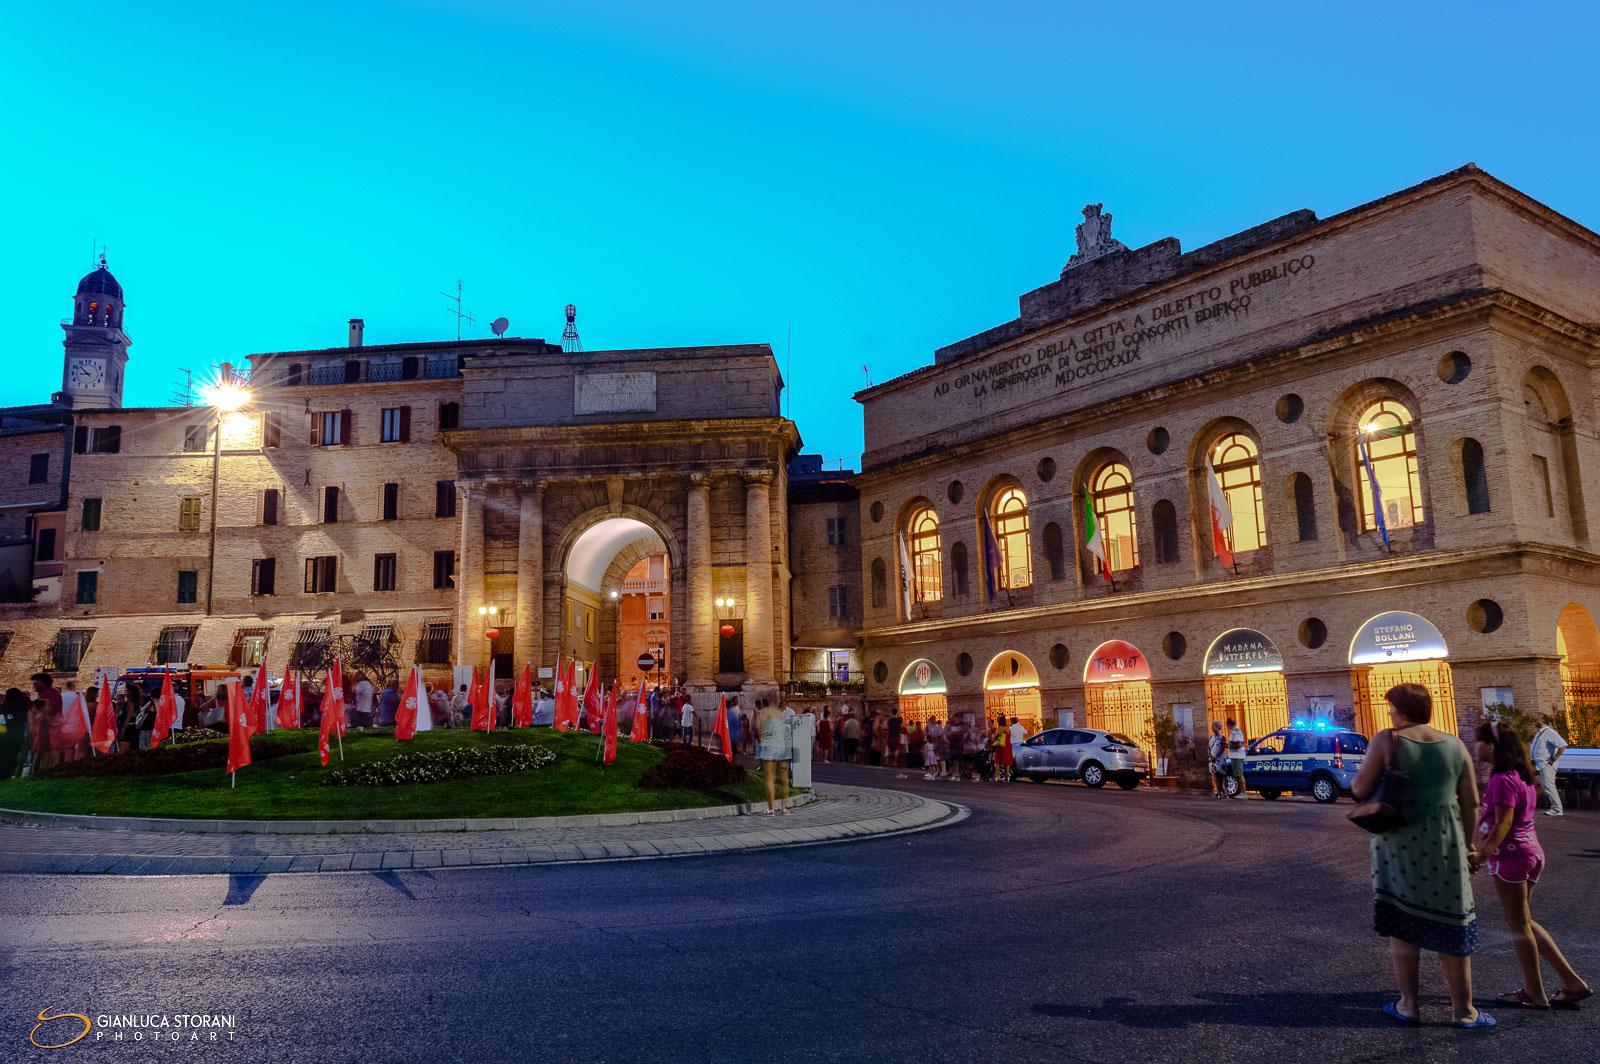 Notte dell'Opera 2017 - Gianluca Storani Photo Art  (ID: 4-1409)